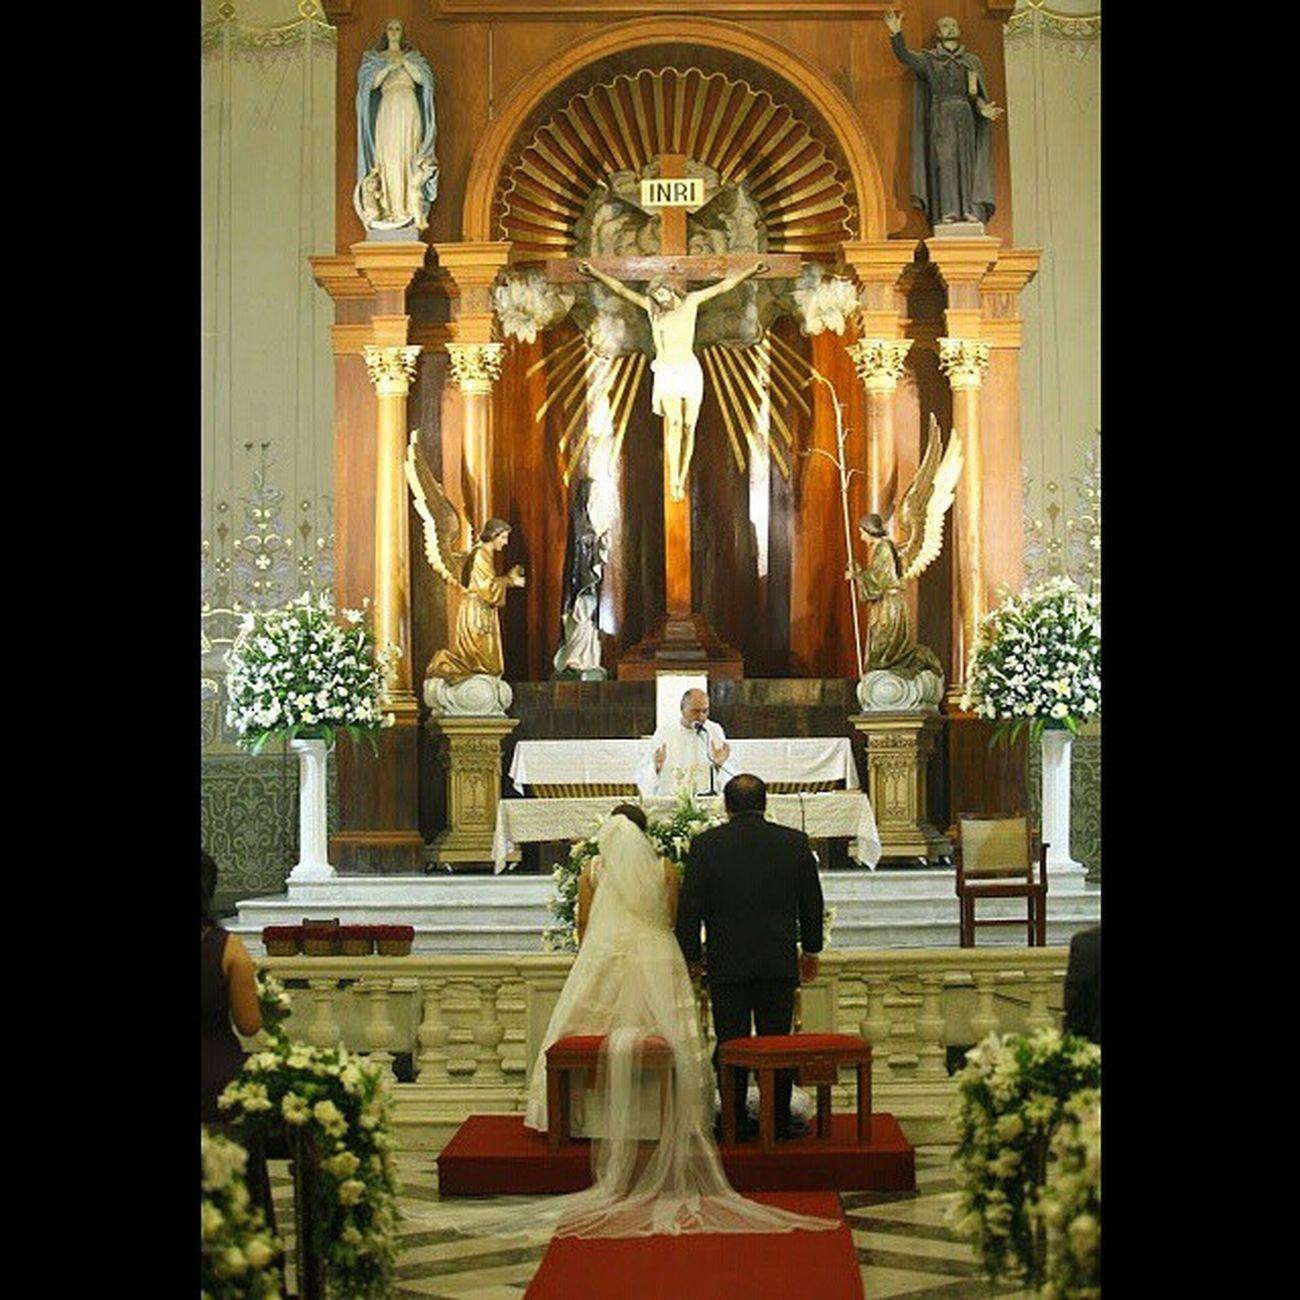 Canon 5dmarkll Amor Arquitectura Weddingphotographer Wedding Weddinphotography Iglesia Arte Novia Mérida Yúcatan